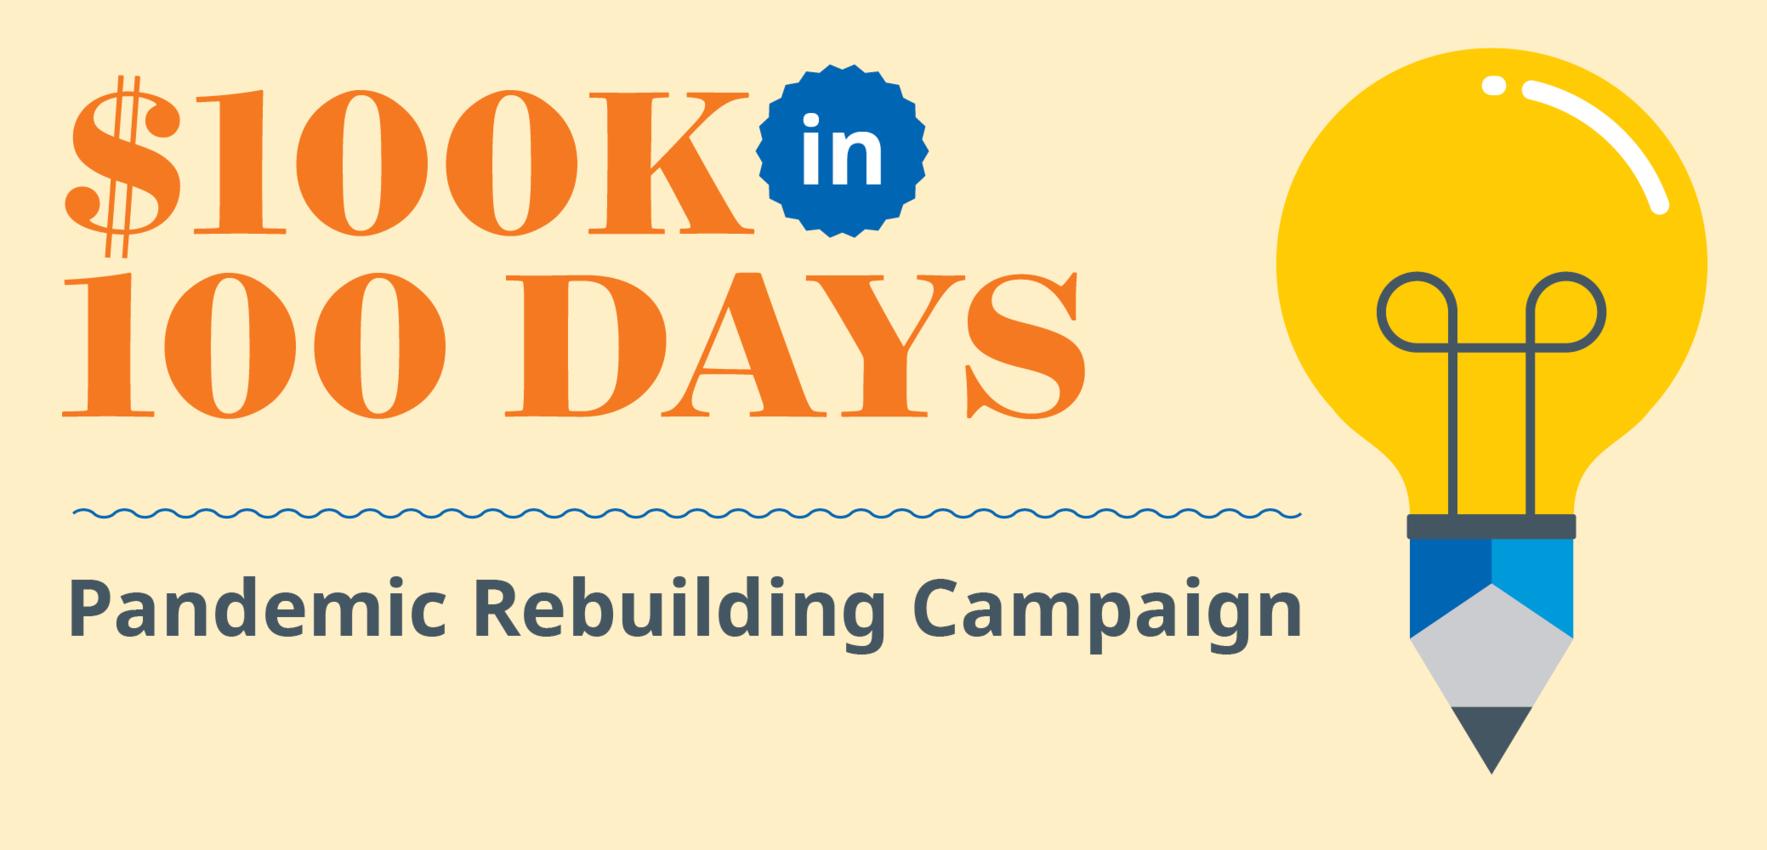 Pandemic Rebuilding Campaign image